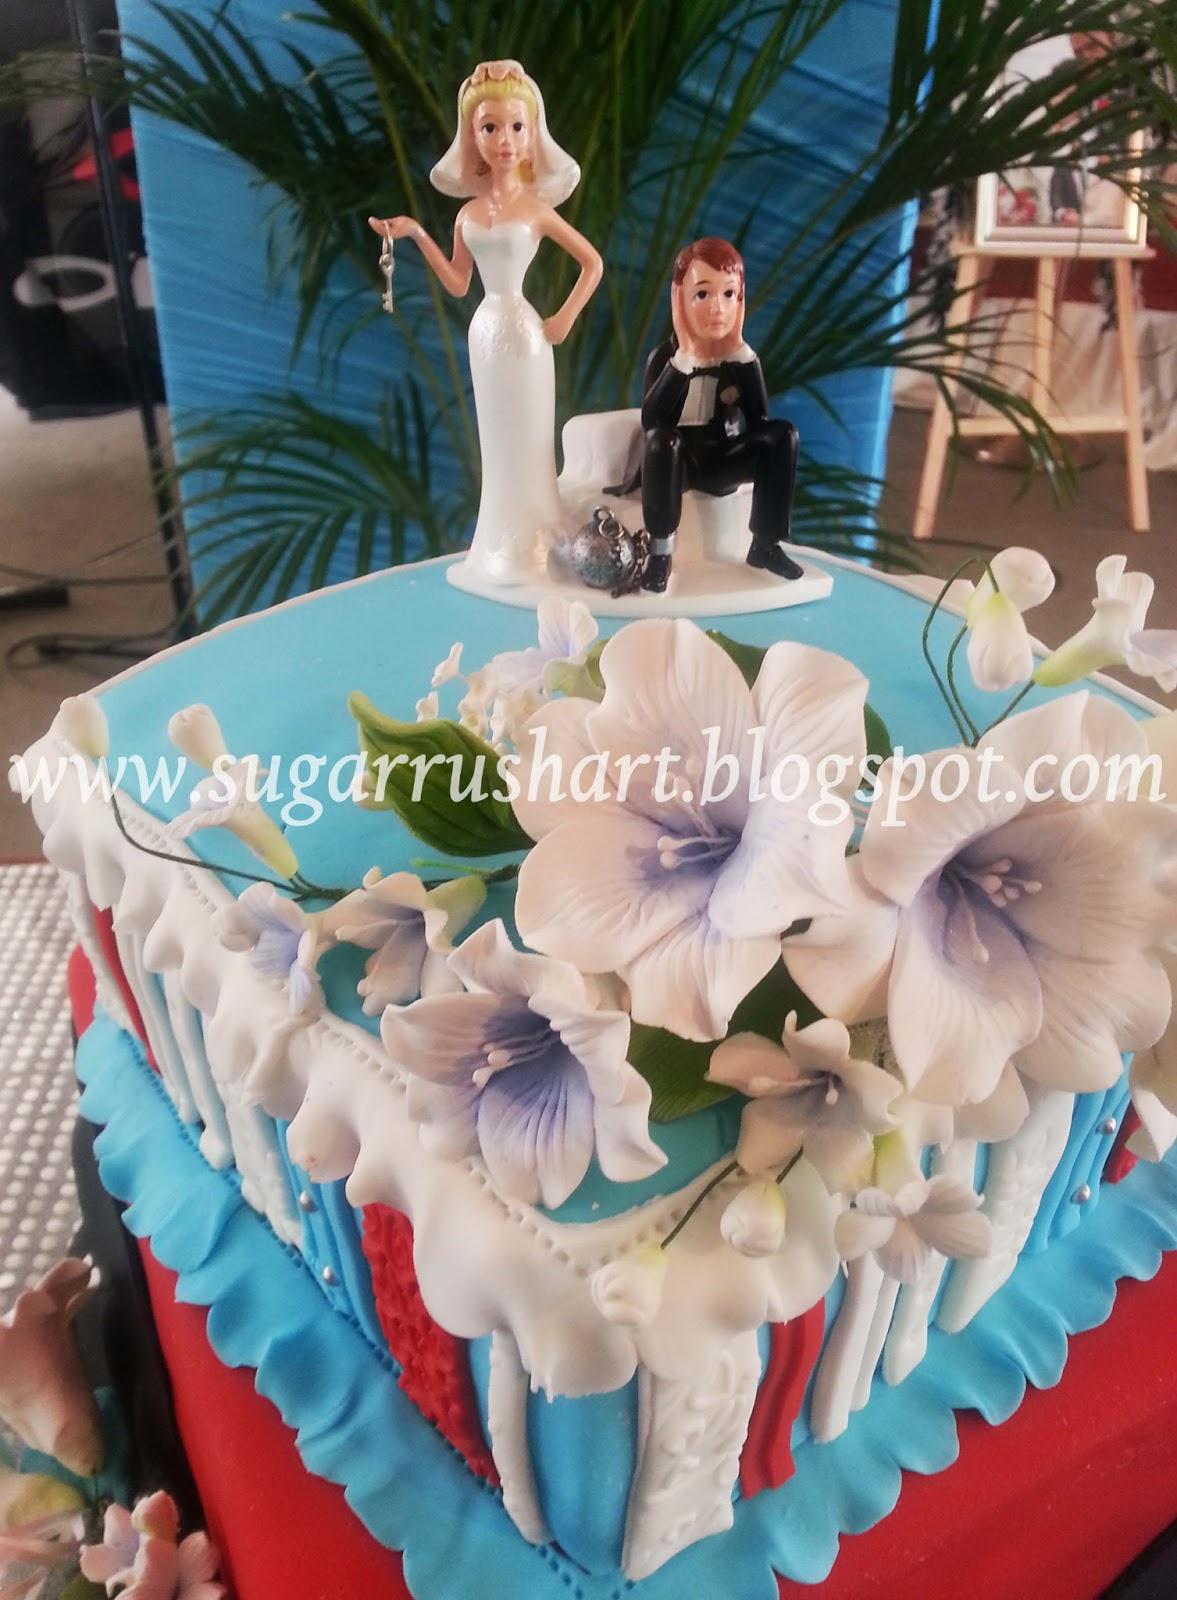 sugar rush art Tiffany Blue and Red wedding cake